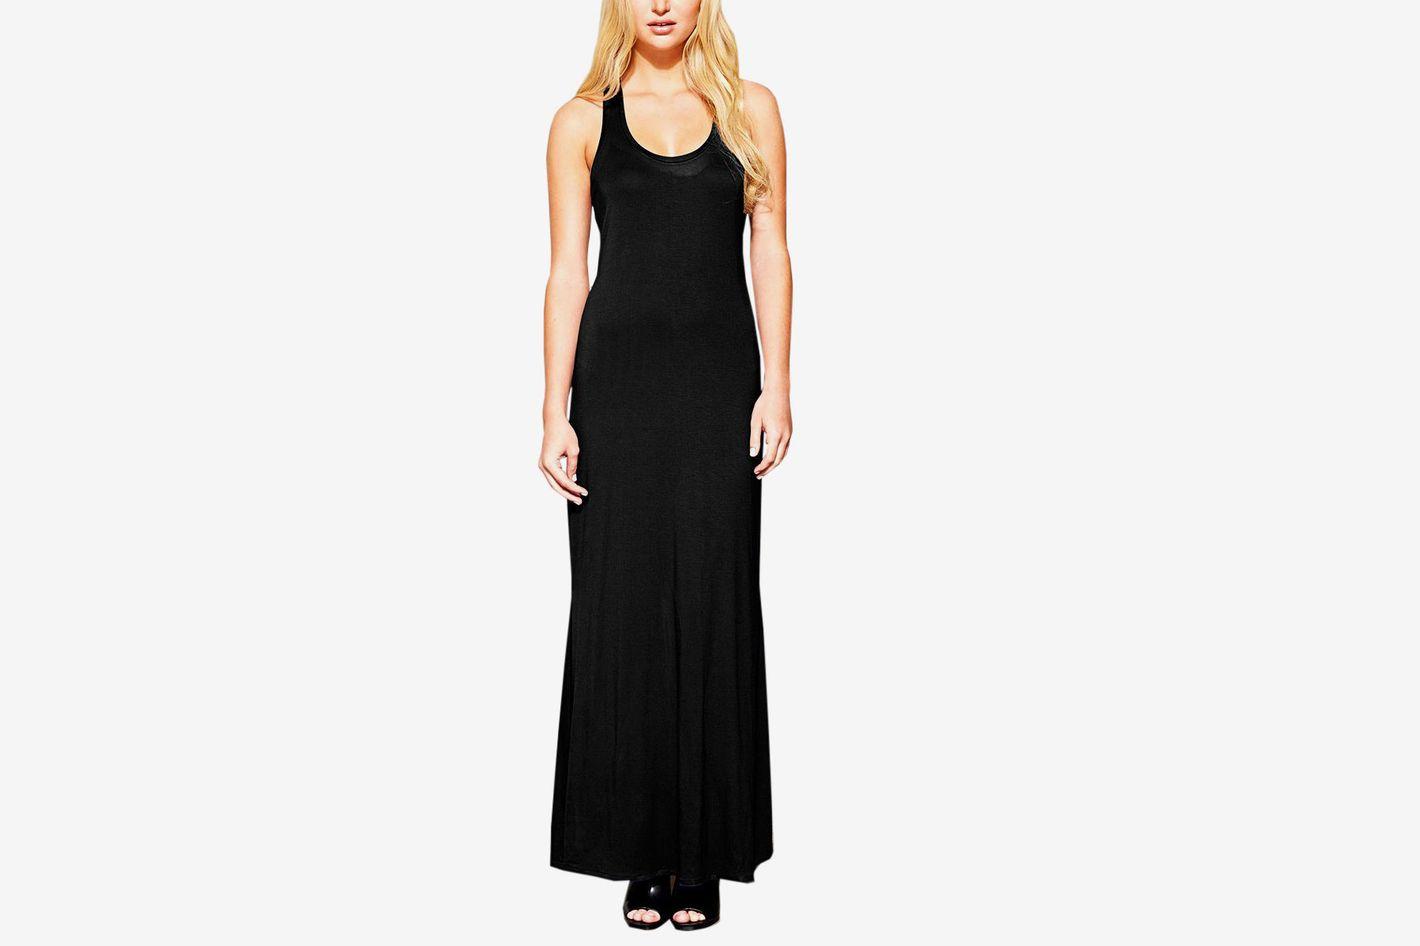 Cosabella Brera Slit Maxi Dress